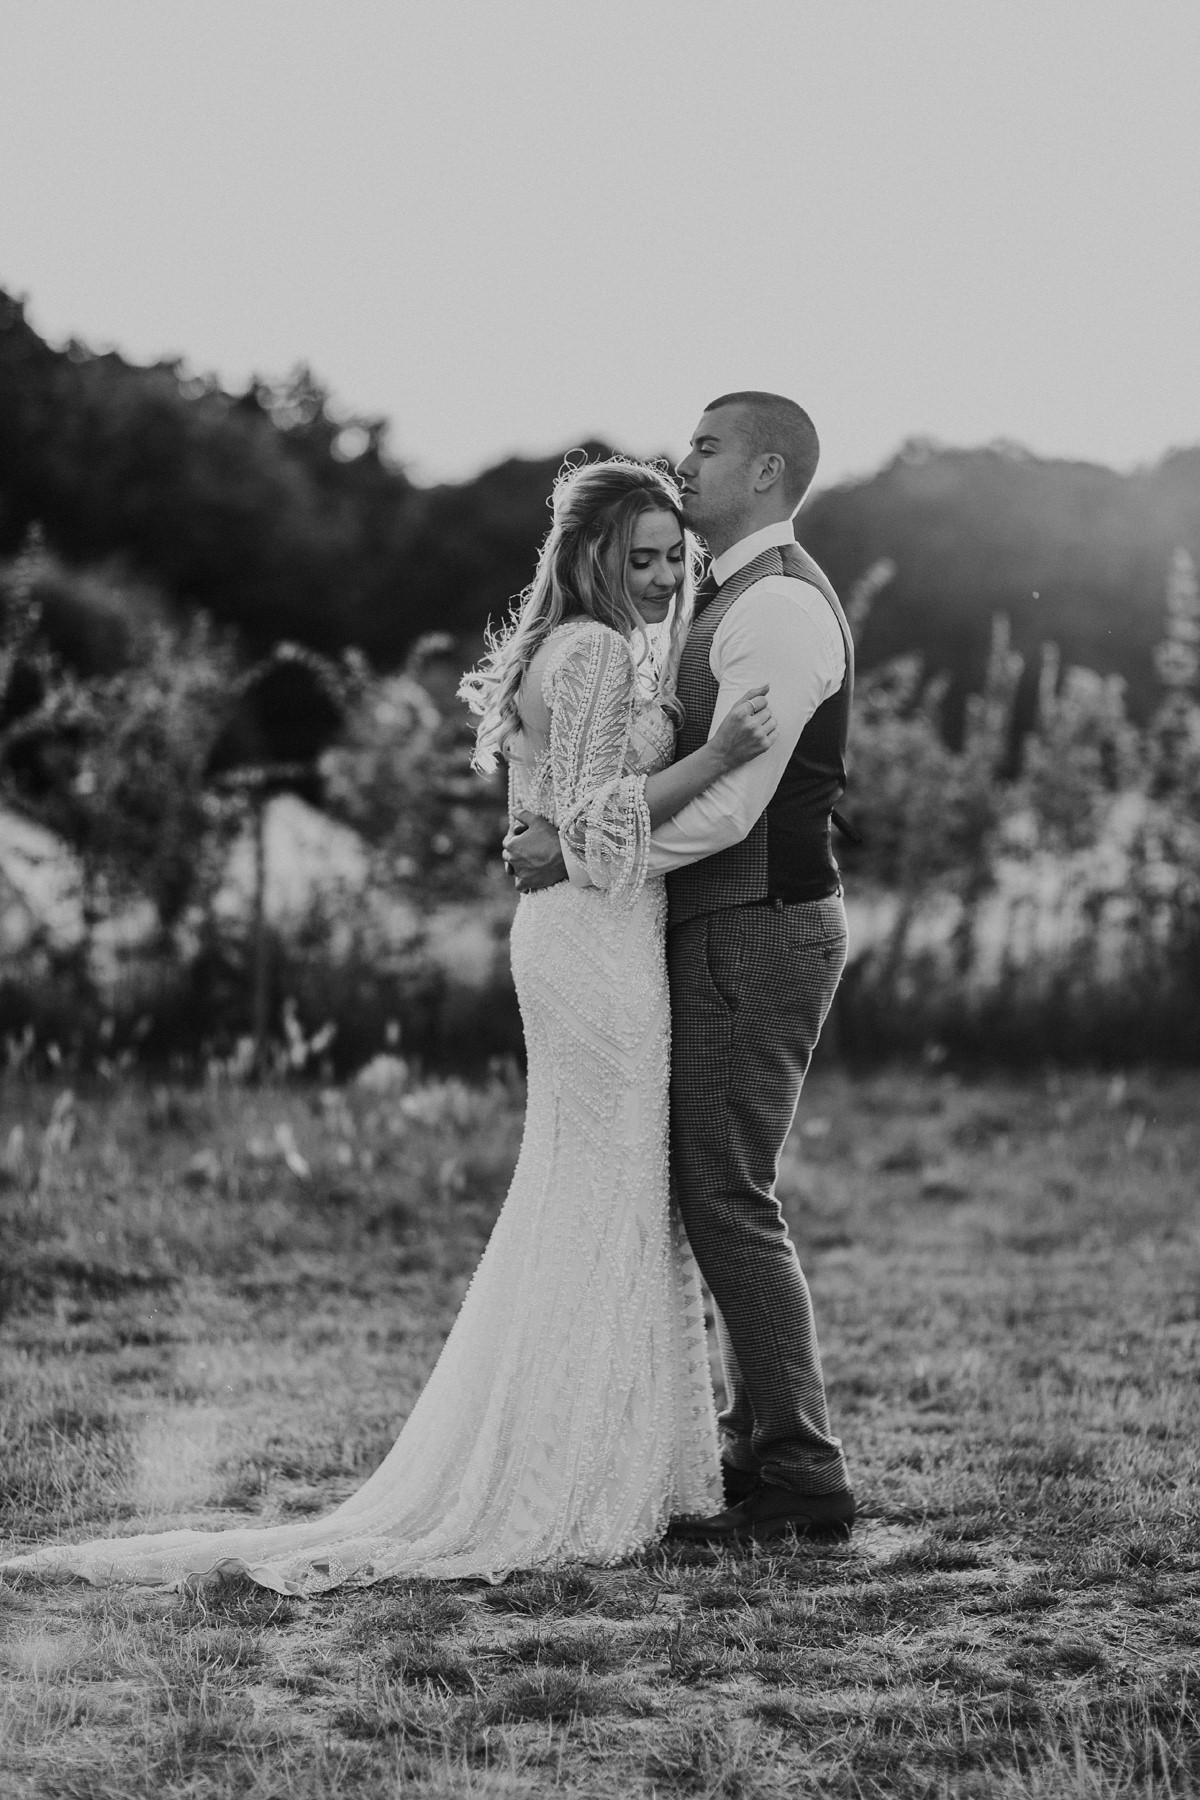 black and white image of bridal portraits at preston court wedding venue by Canterbury wedding photographers